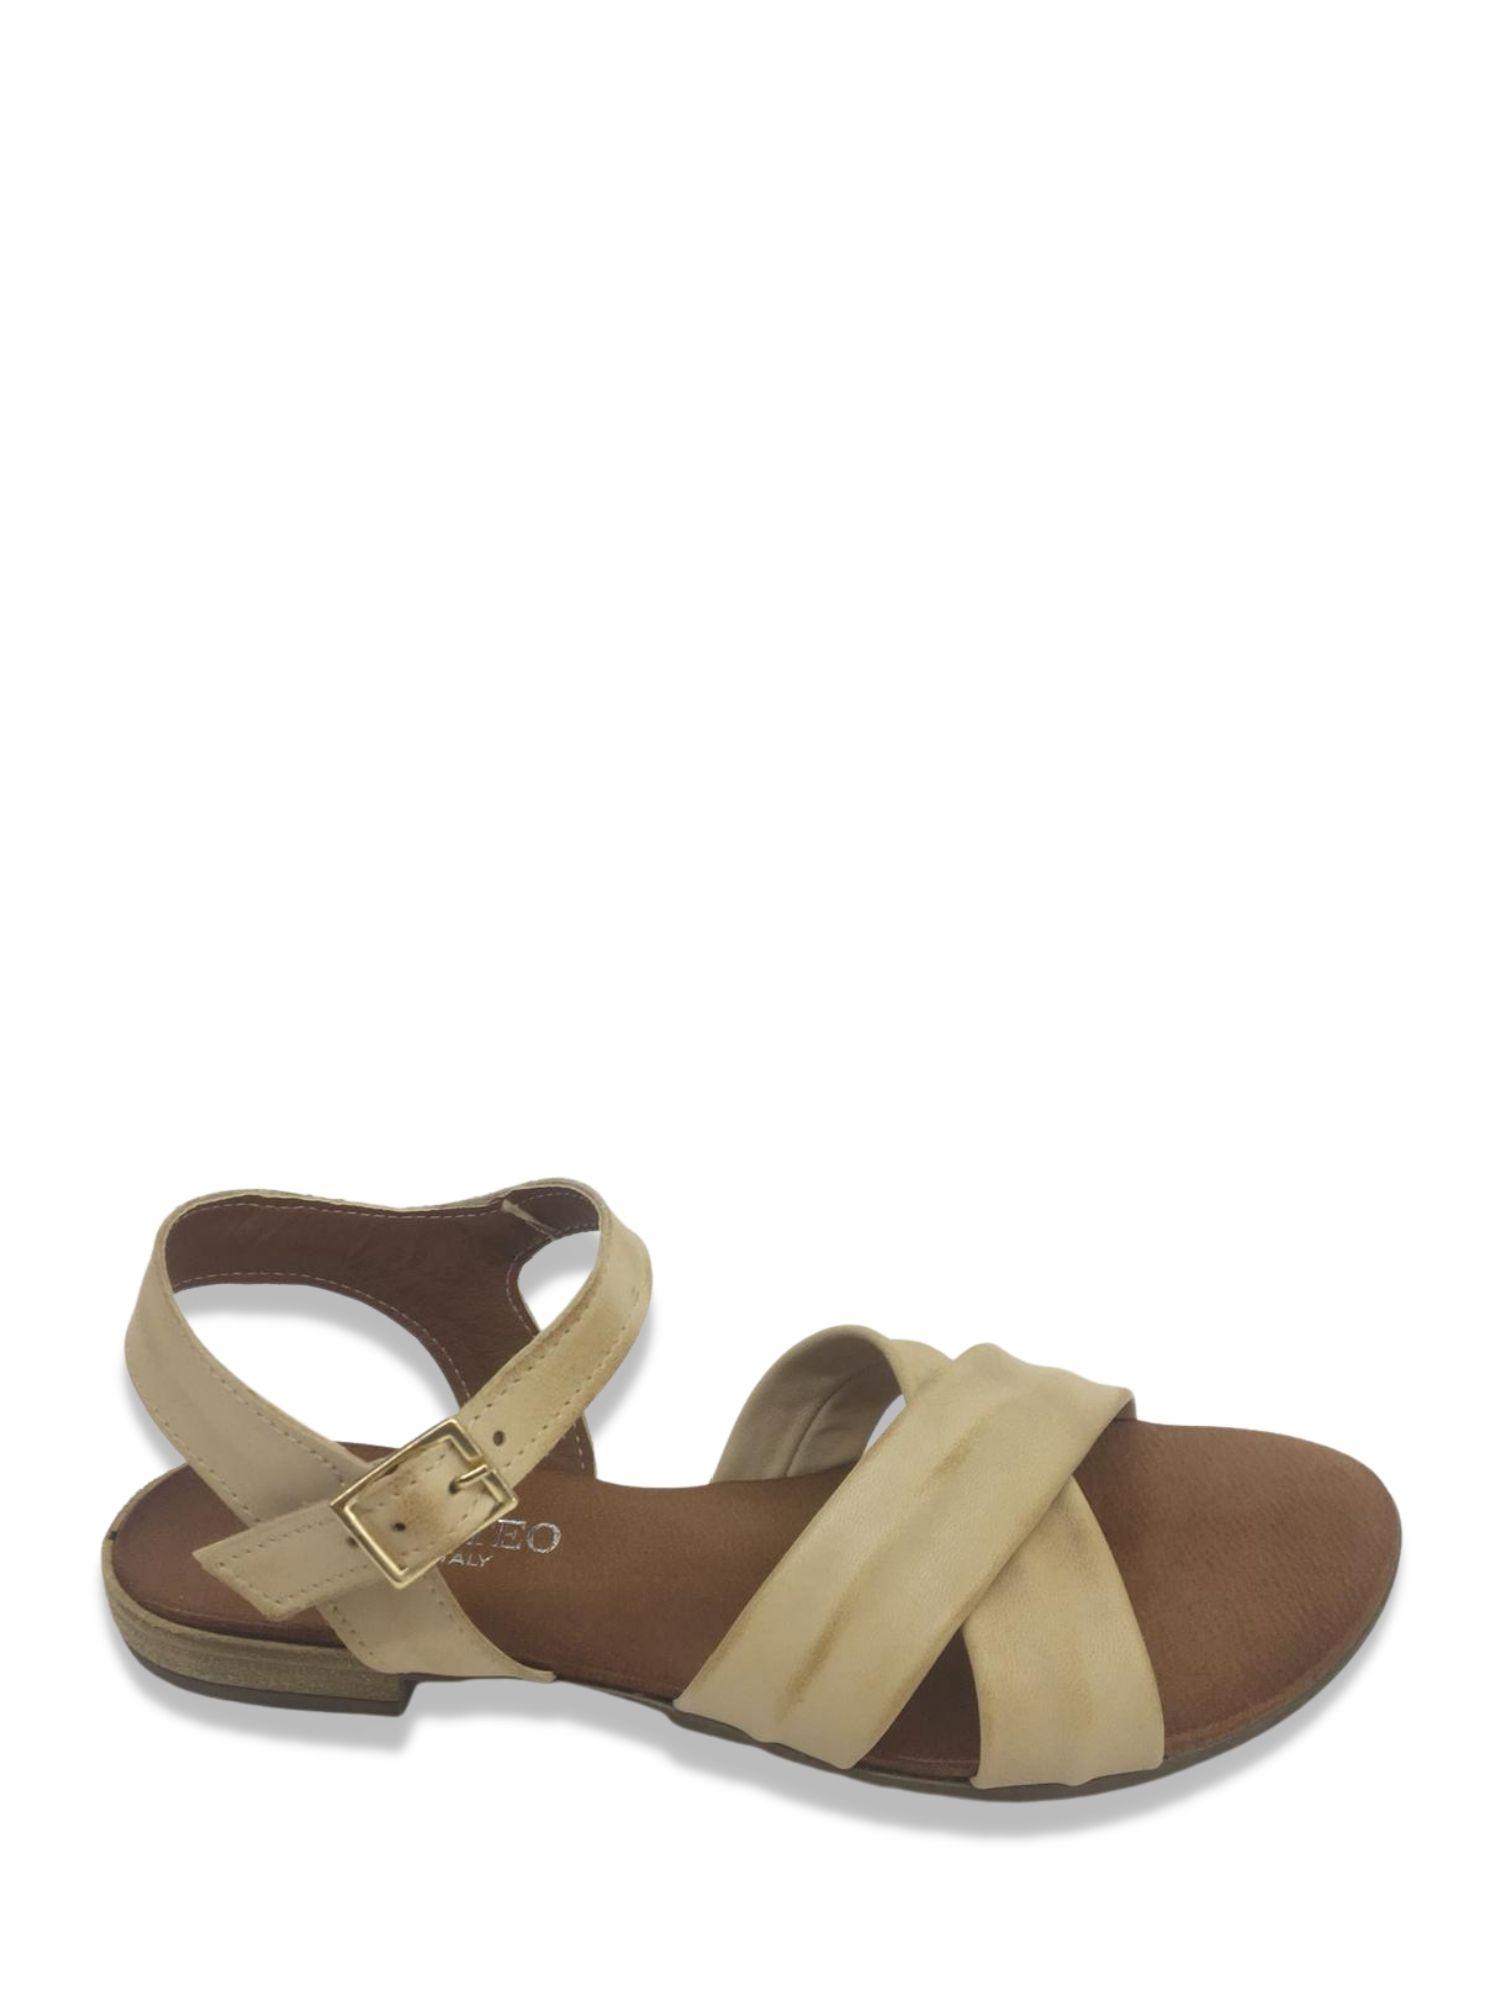 Sandalo Made in Italy 204 Beige